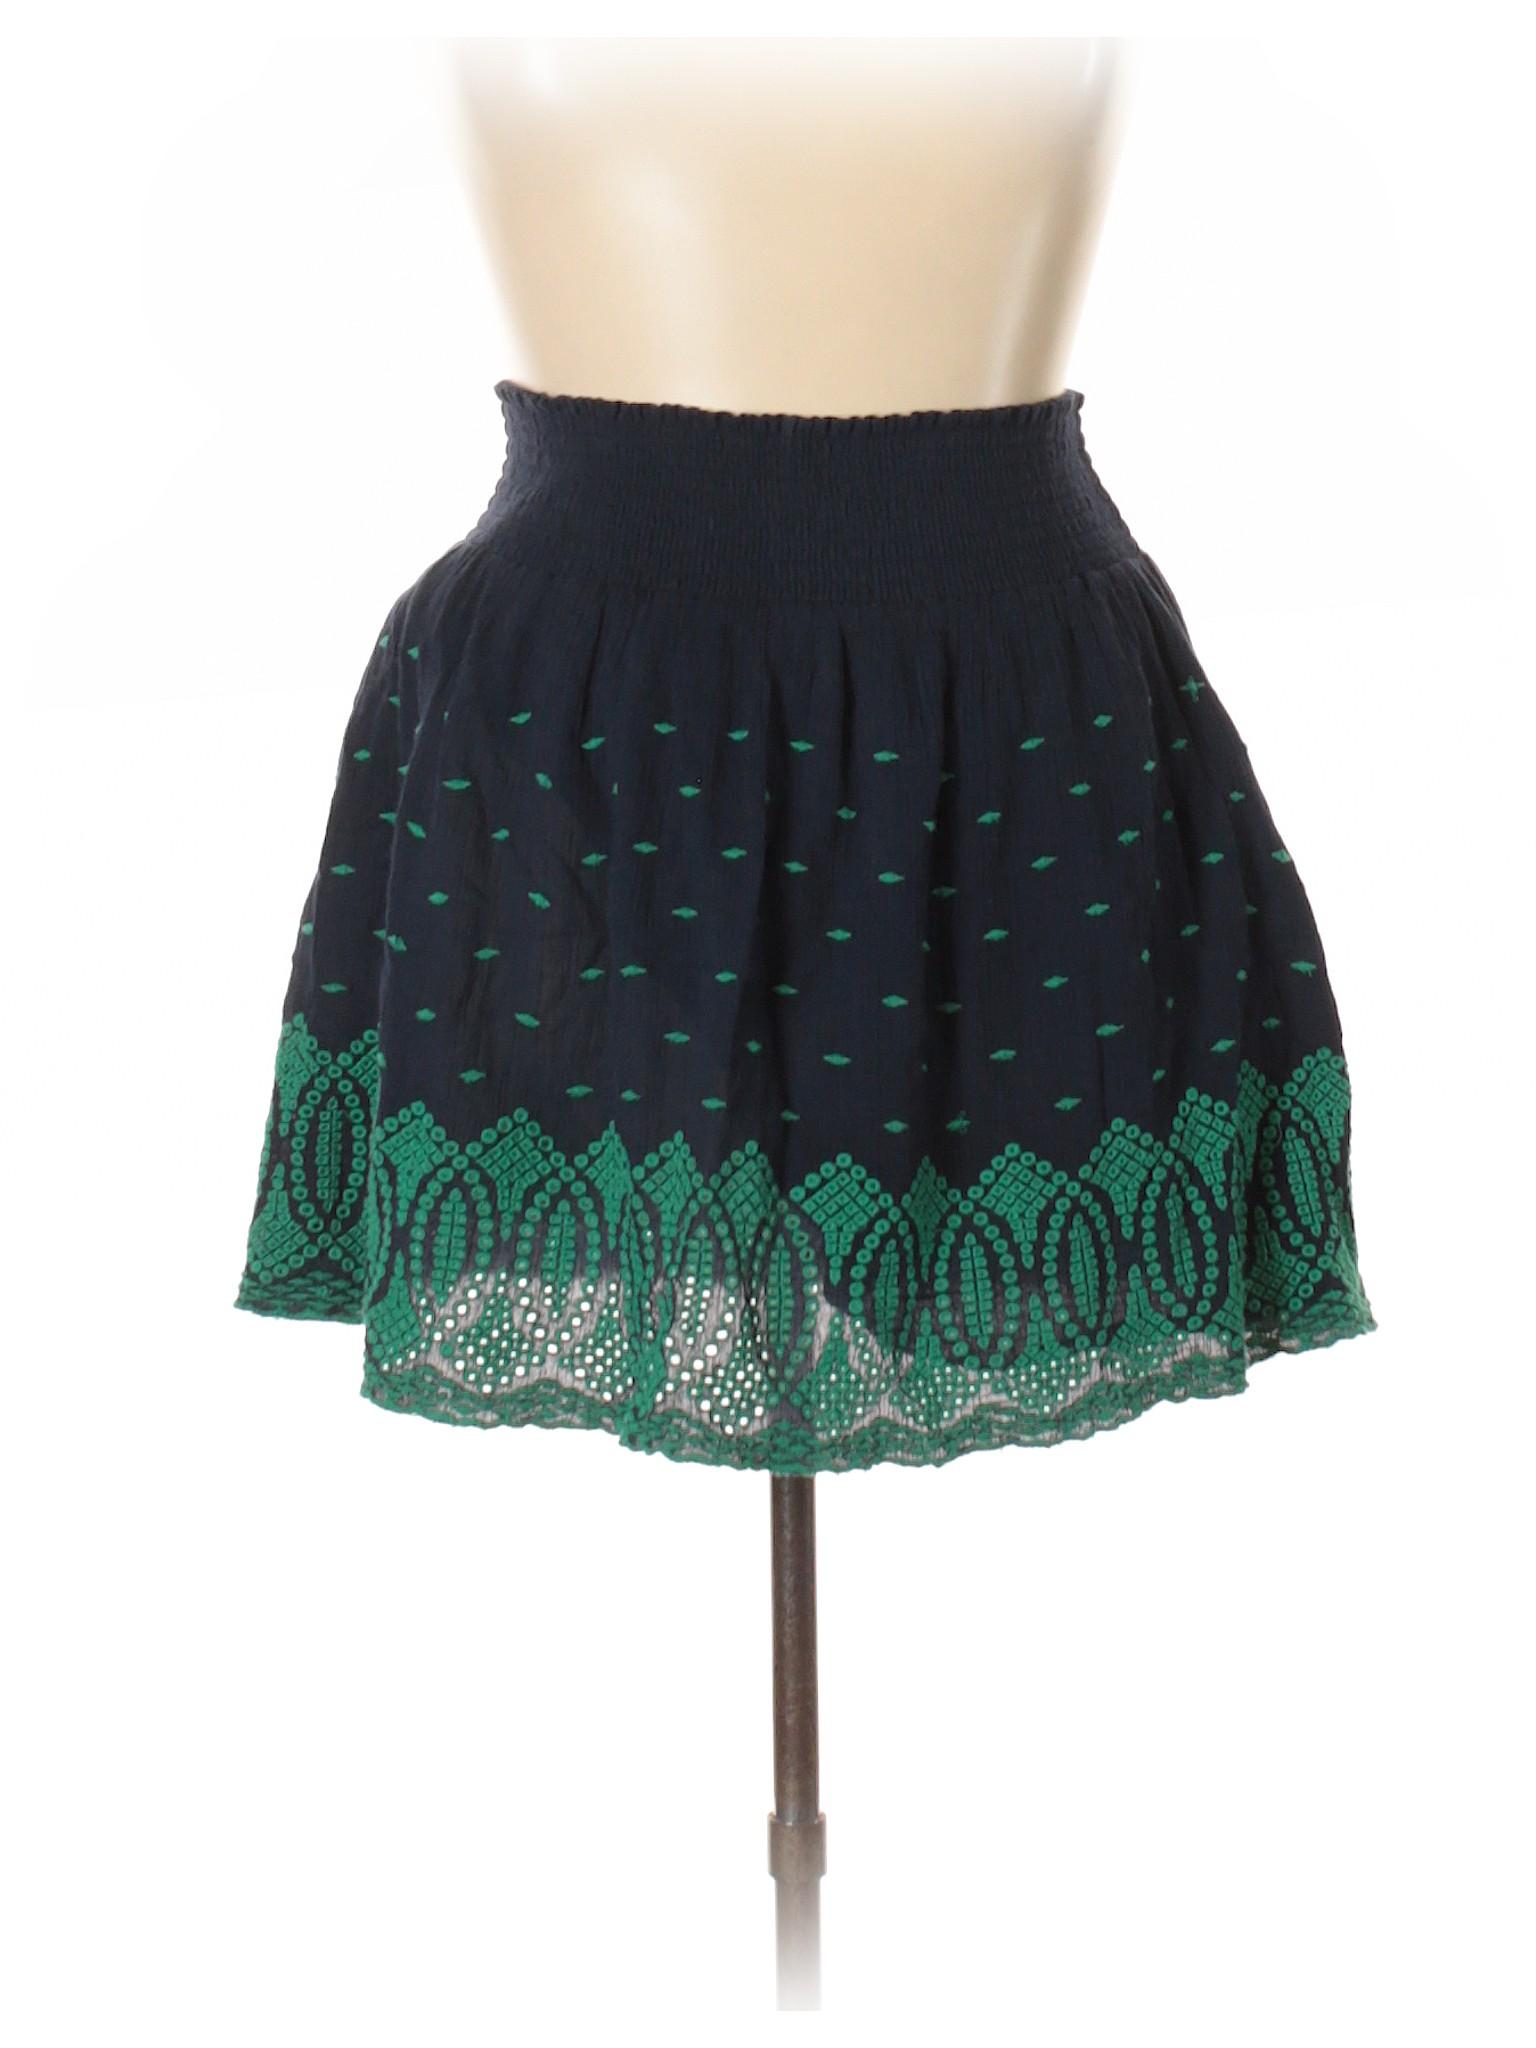 Casual Boutique Casual Skirt Skirt Skirt Boutique Casual Boutique Boutique Z7wnq5